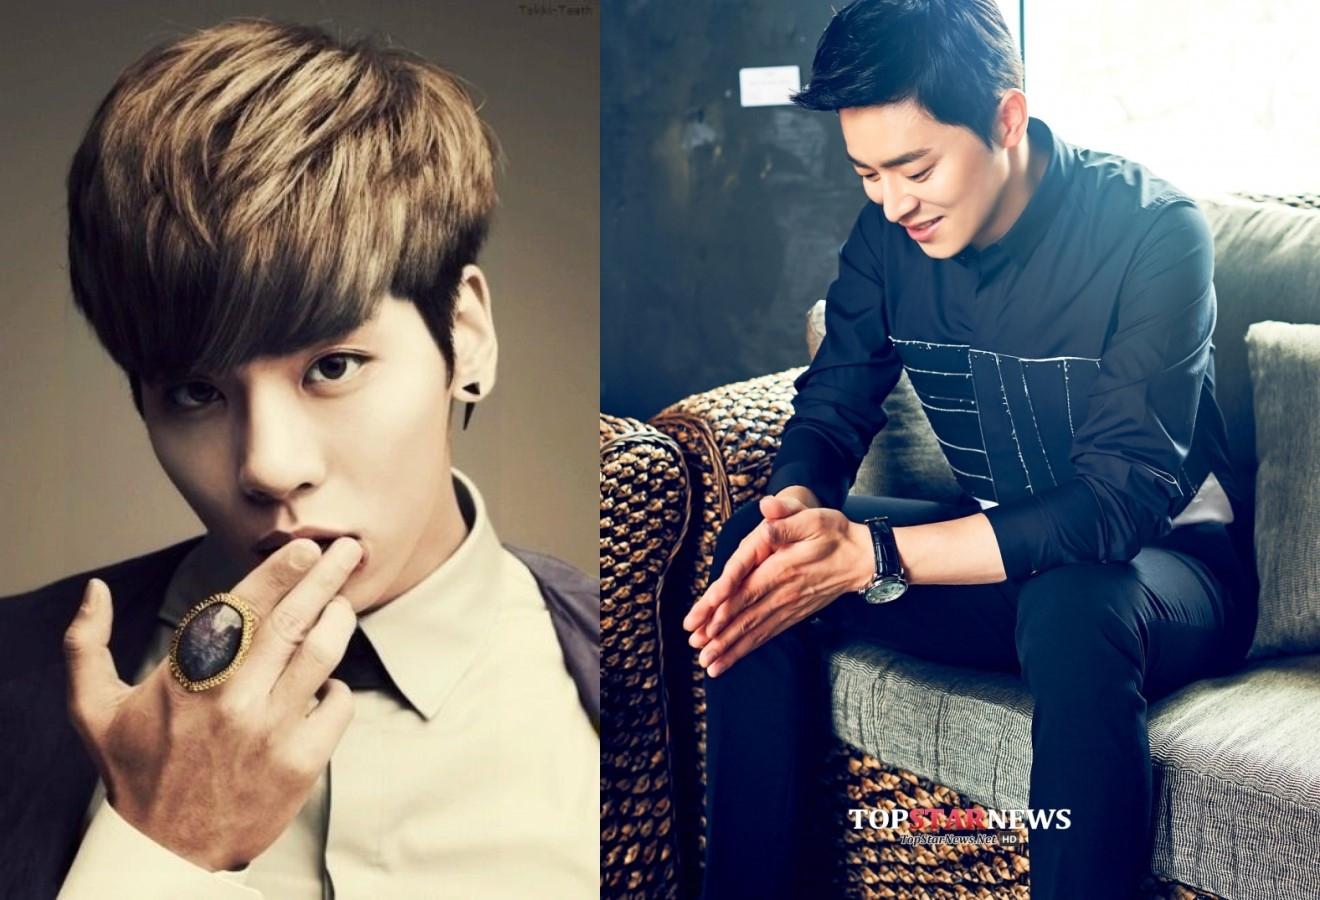 [shinee][新闻]150831 钟铉重生的话 想成为韩剧男主角?